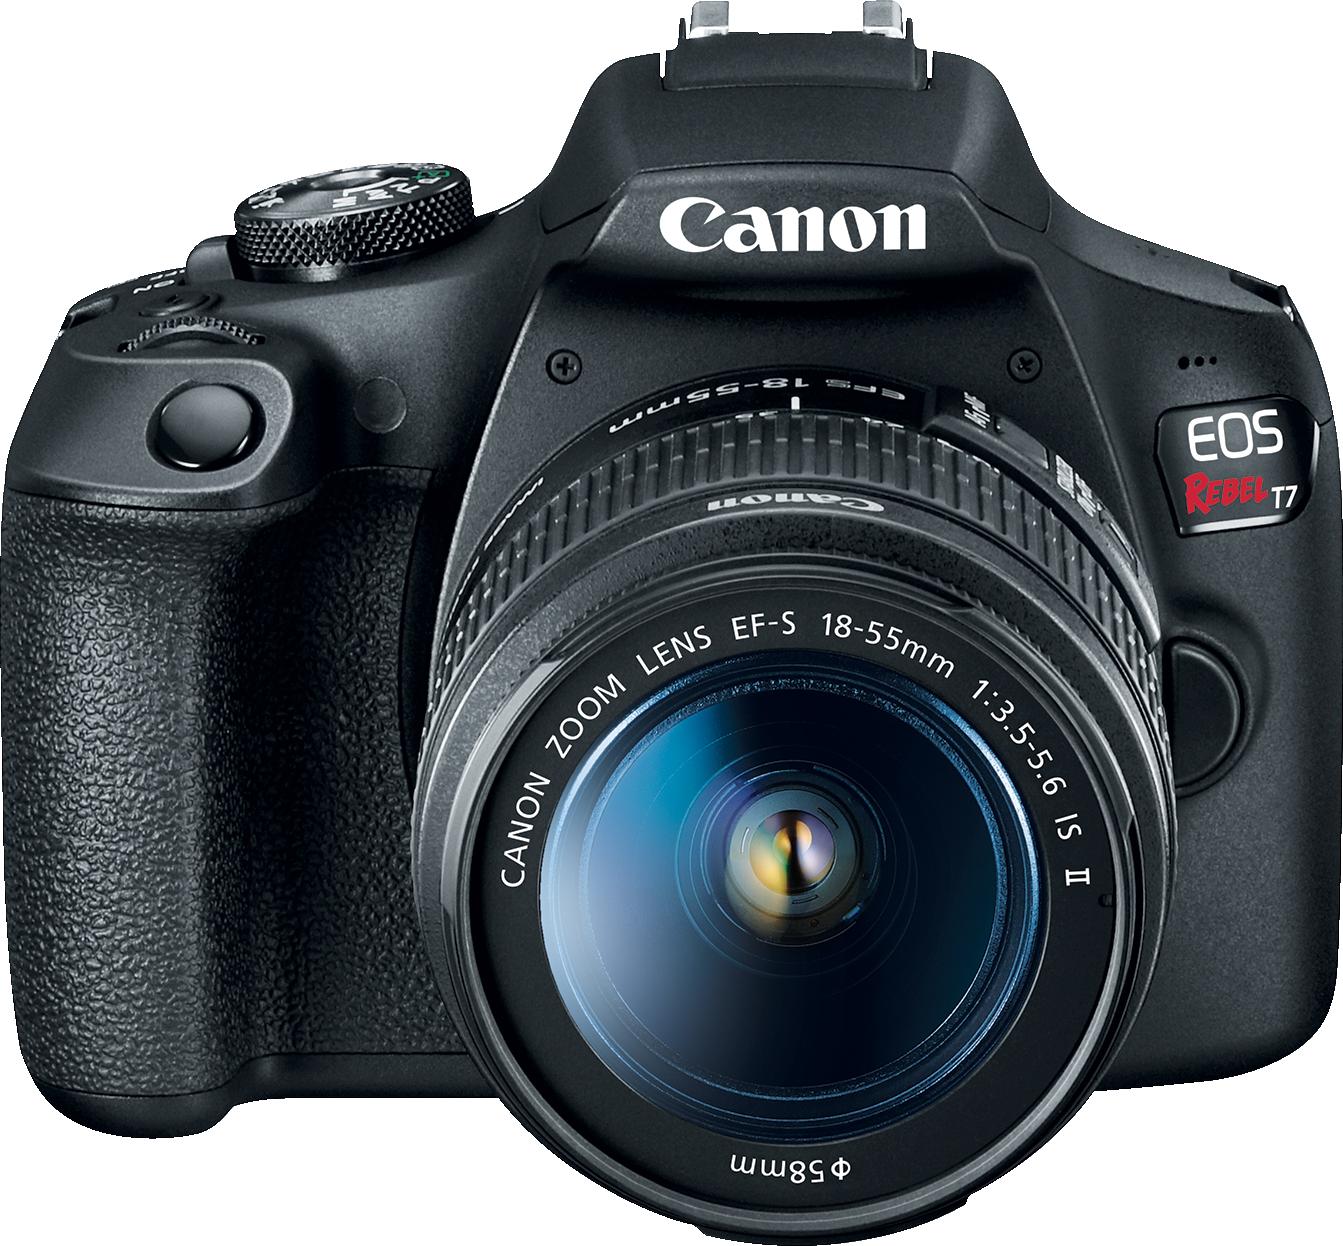 Canon Eos 2000d: Canon EOS Rebel T7 (EOS 2000D): Digital Photography Review